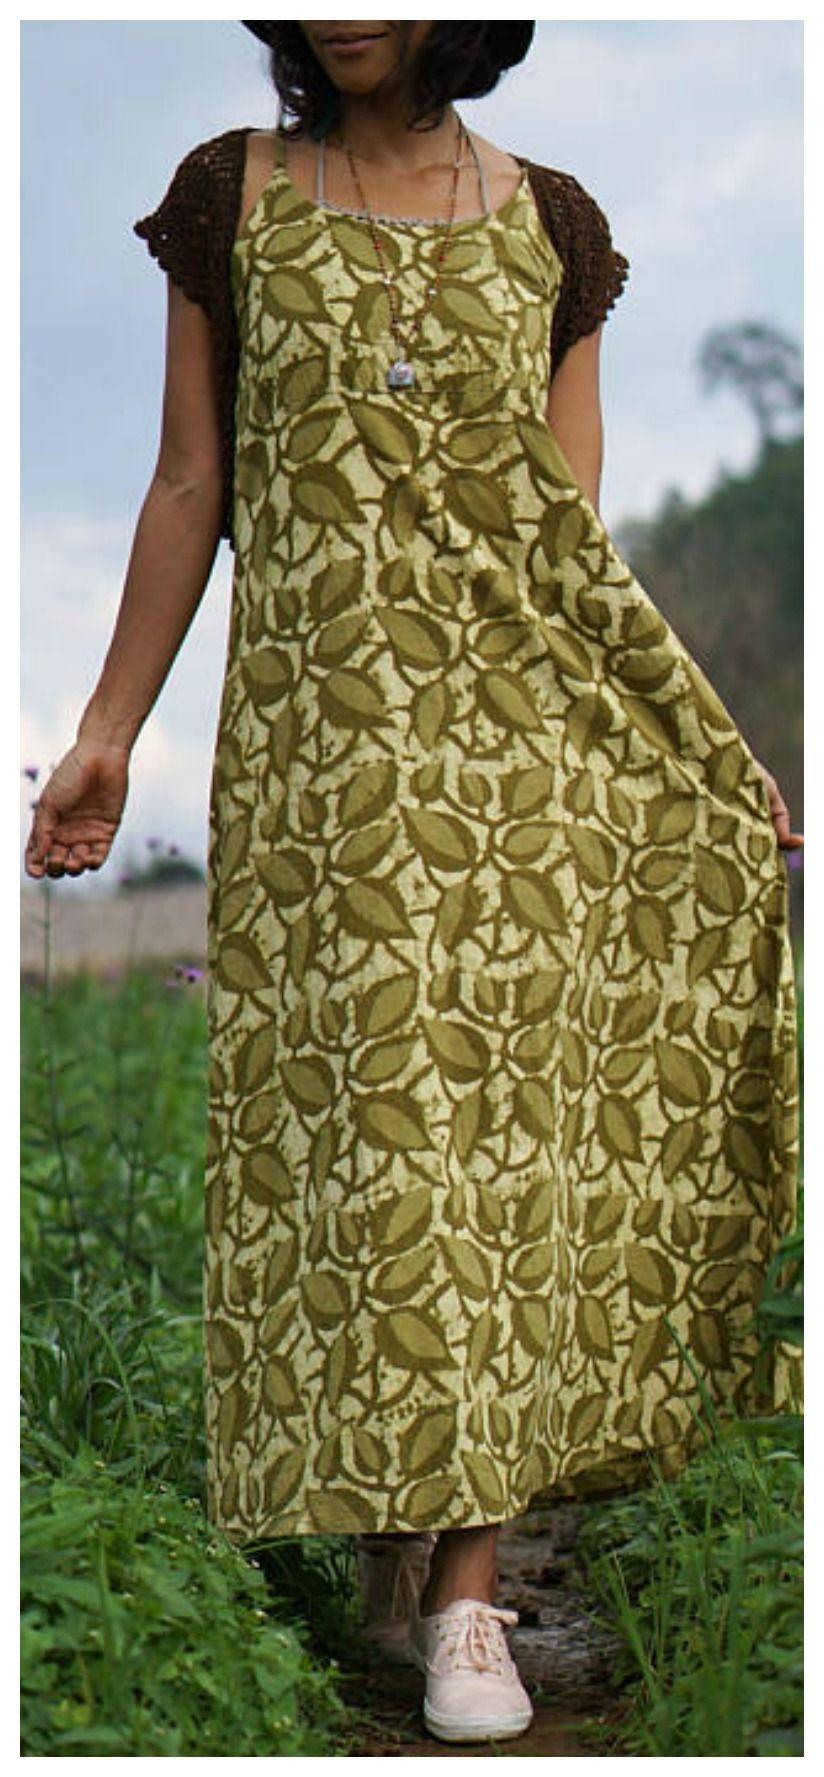 Floral dress maxi gypsy dresses boho summer maxi dress cotton